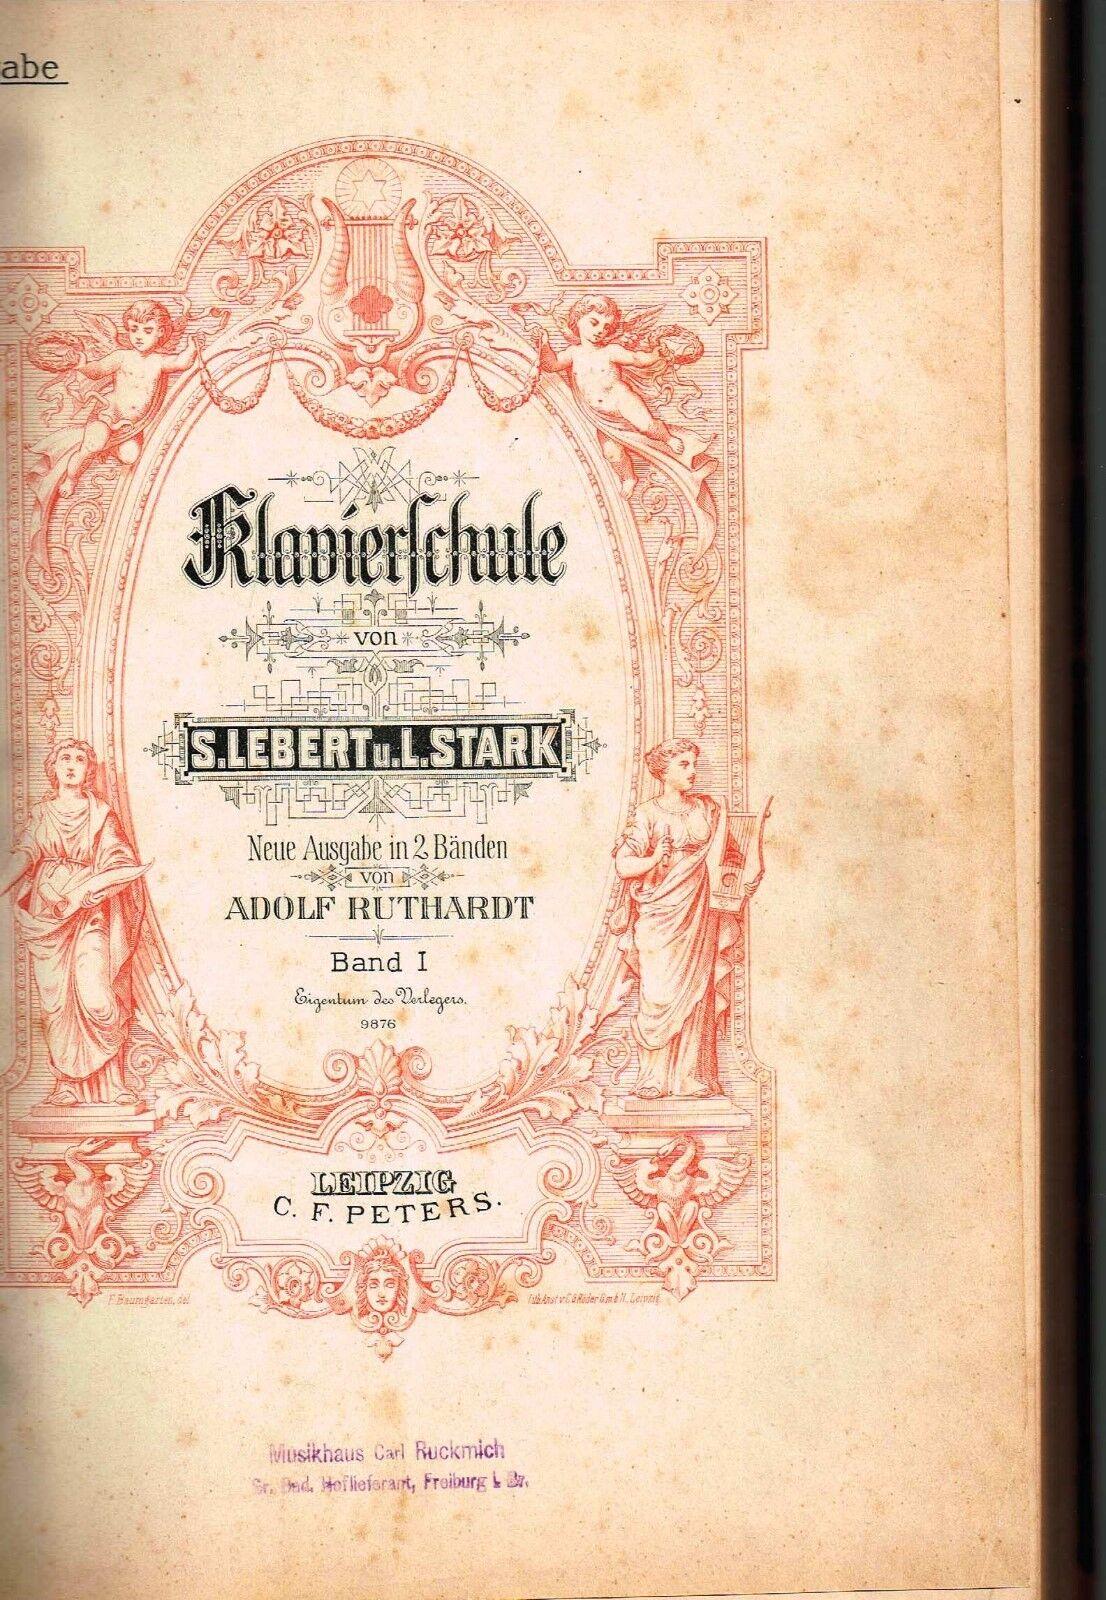 Notenbuch Kriegsausgabe Klavierschule Leipzig Peters Lebert Stark